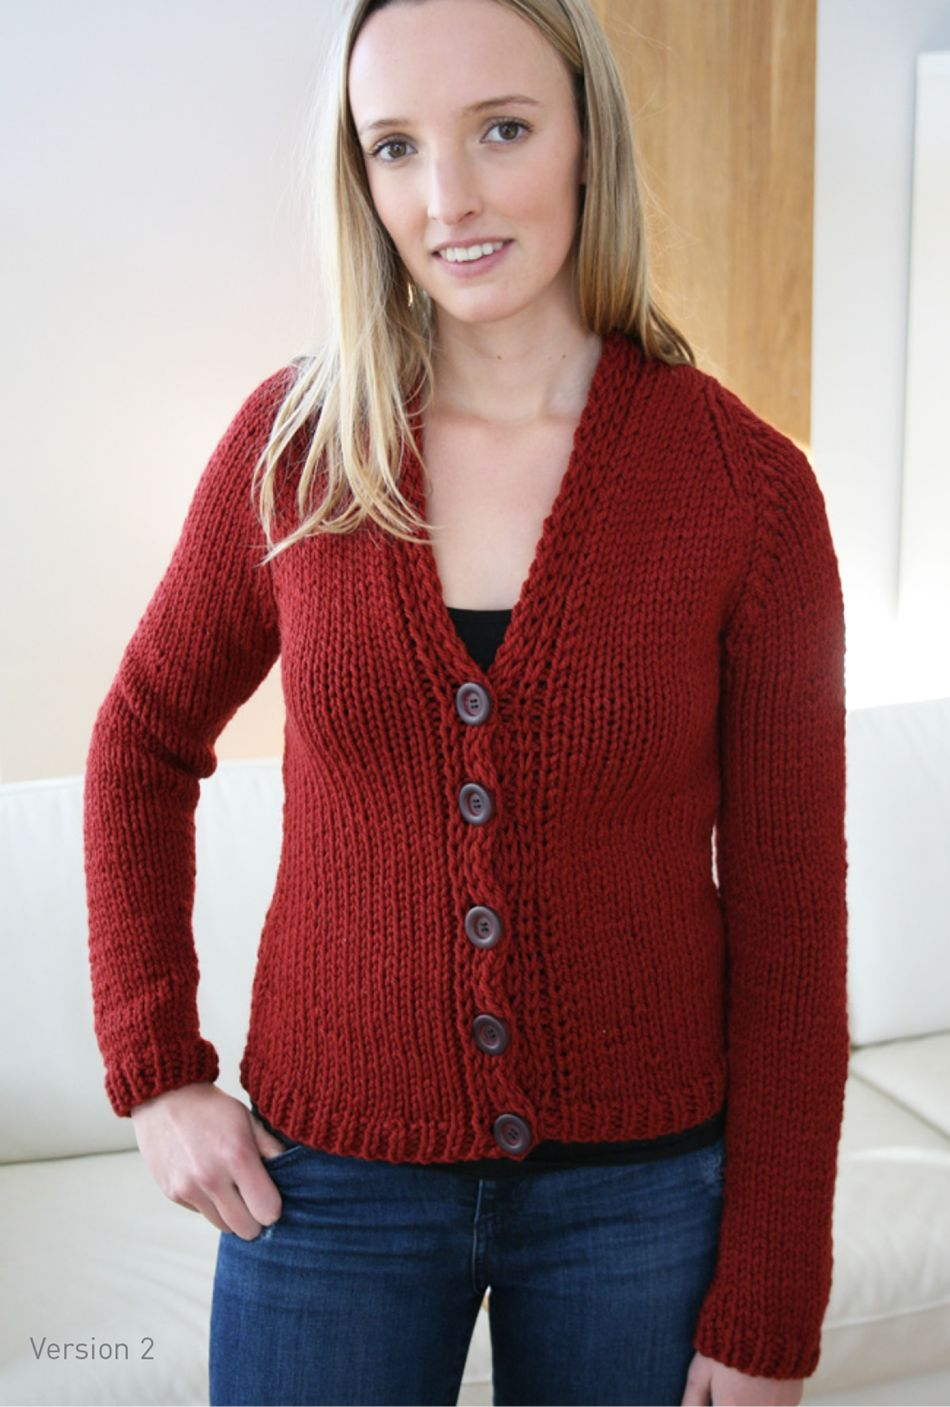 Quick Cardigan Knitting Pattern : Jo Sharp Quick Ultra Cardigan Pattern, Knitting Pattern - Halcyon Yarn